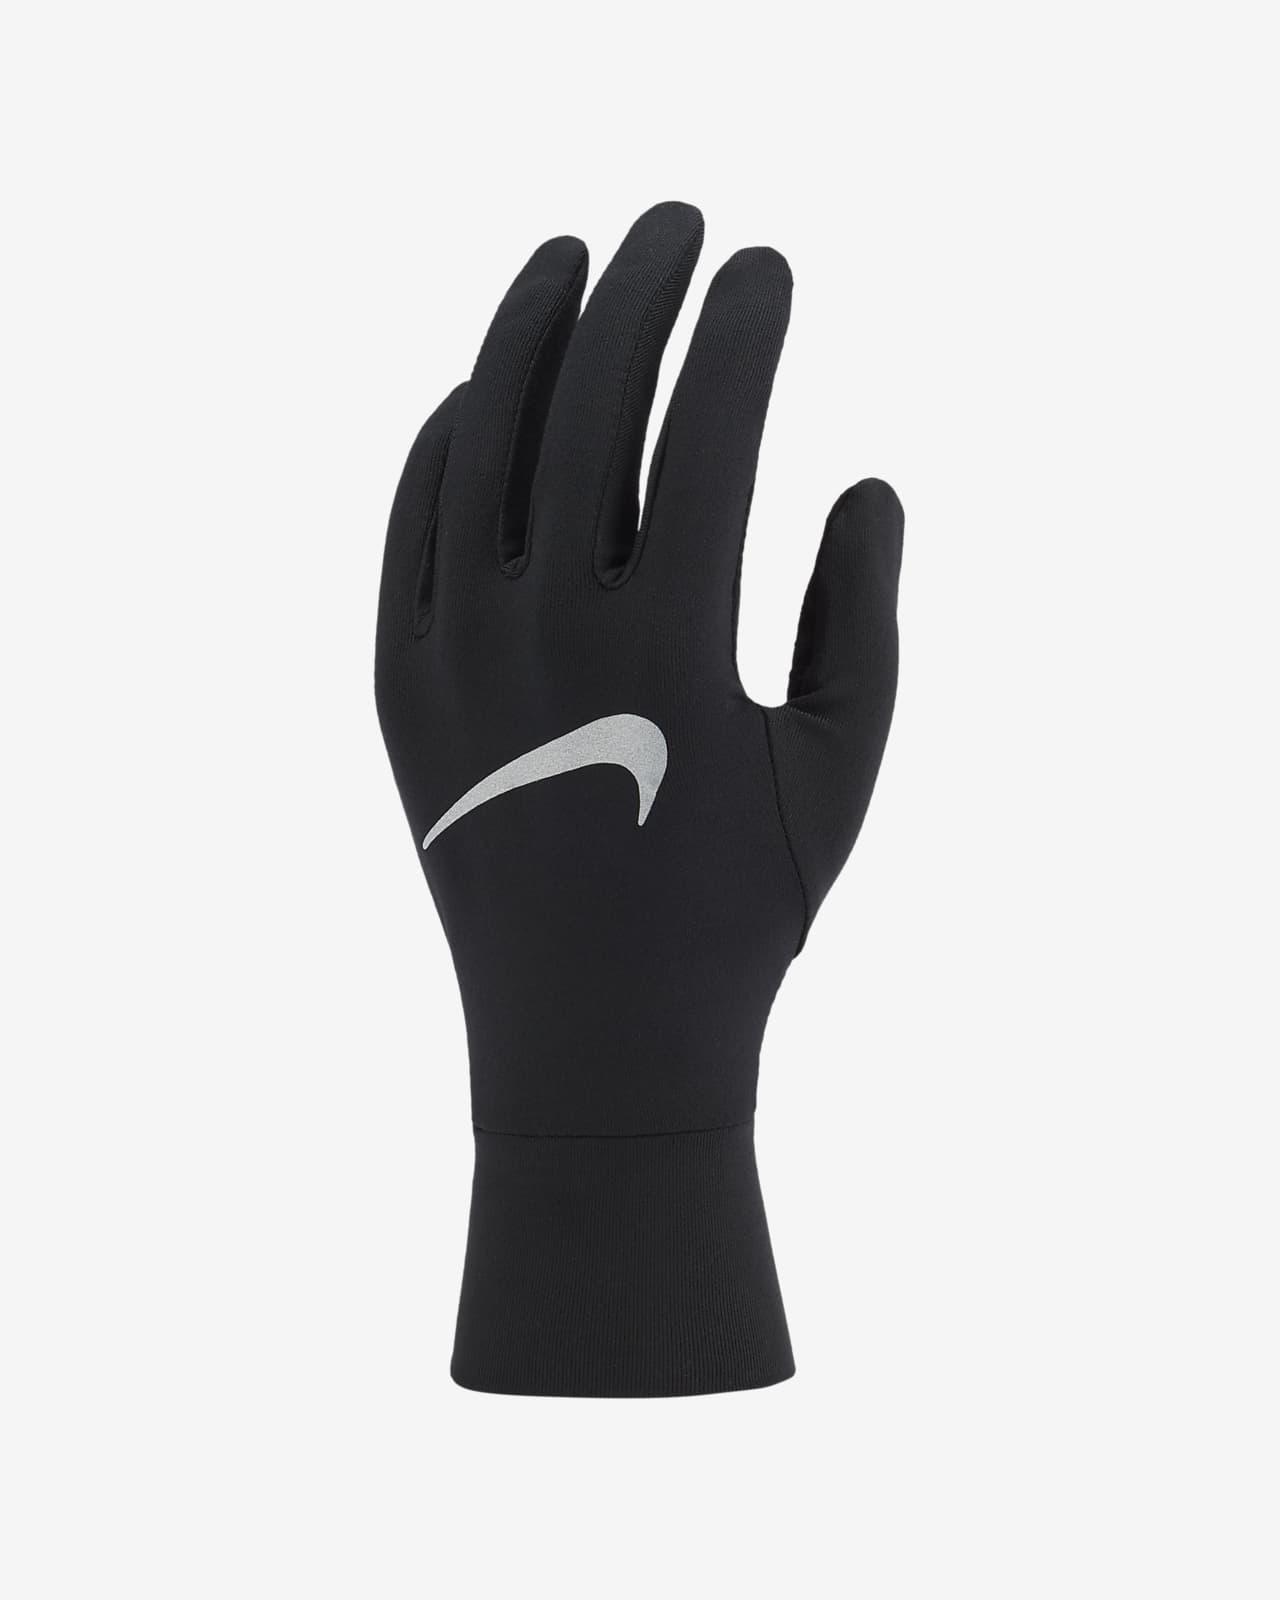 Nike Accelerate Women's Running Gloves